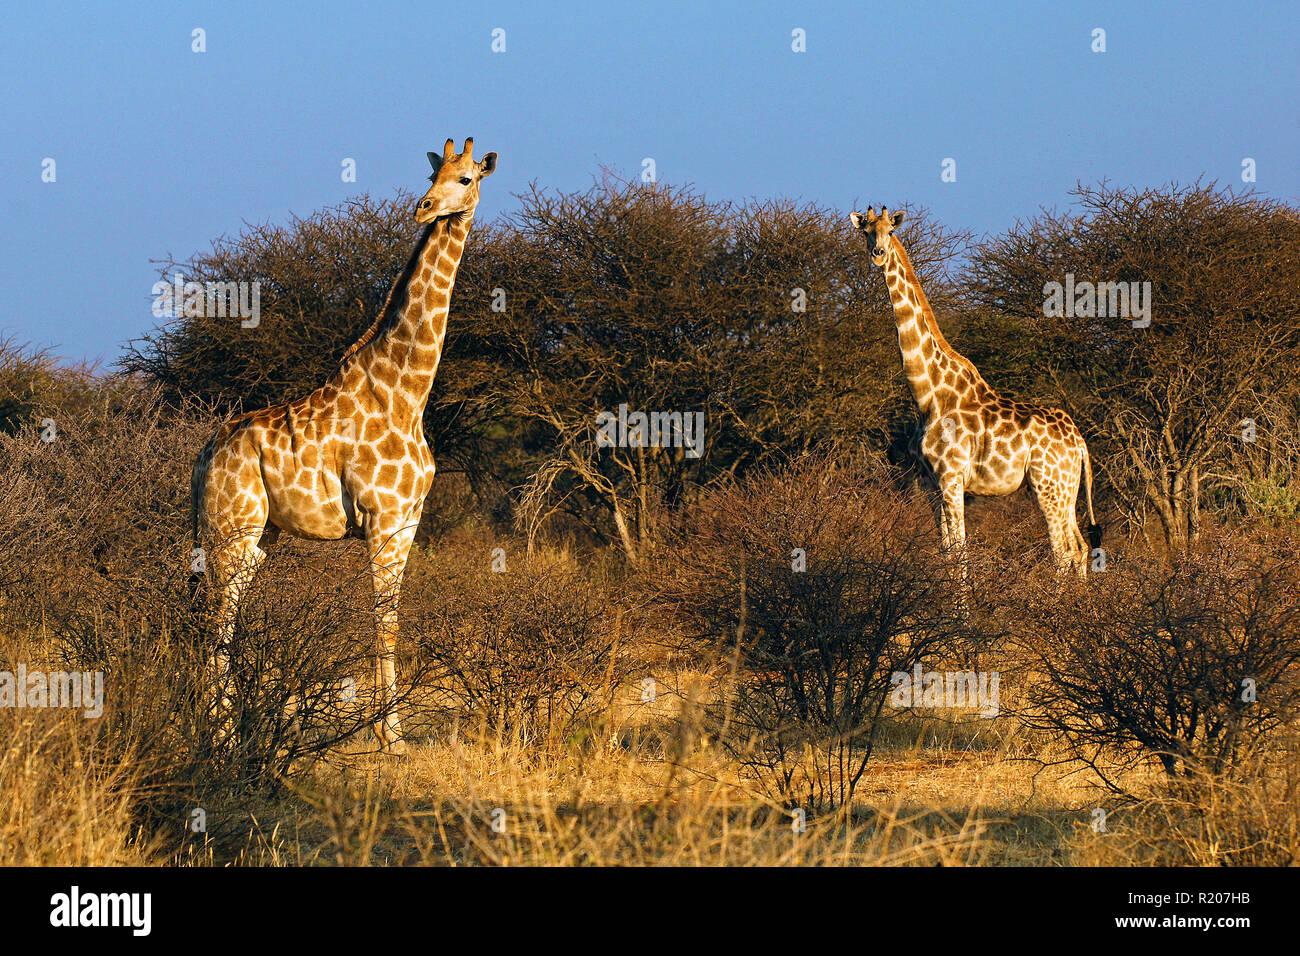 Two Angolan giraffes or Namibian giraffes (Giraffa camelopardalis angolensis) at savanna, Etosha Nationalpark, Namibia, Africa - Stock Image